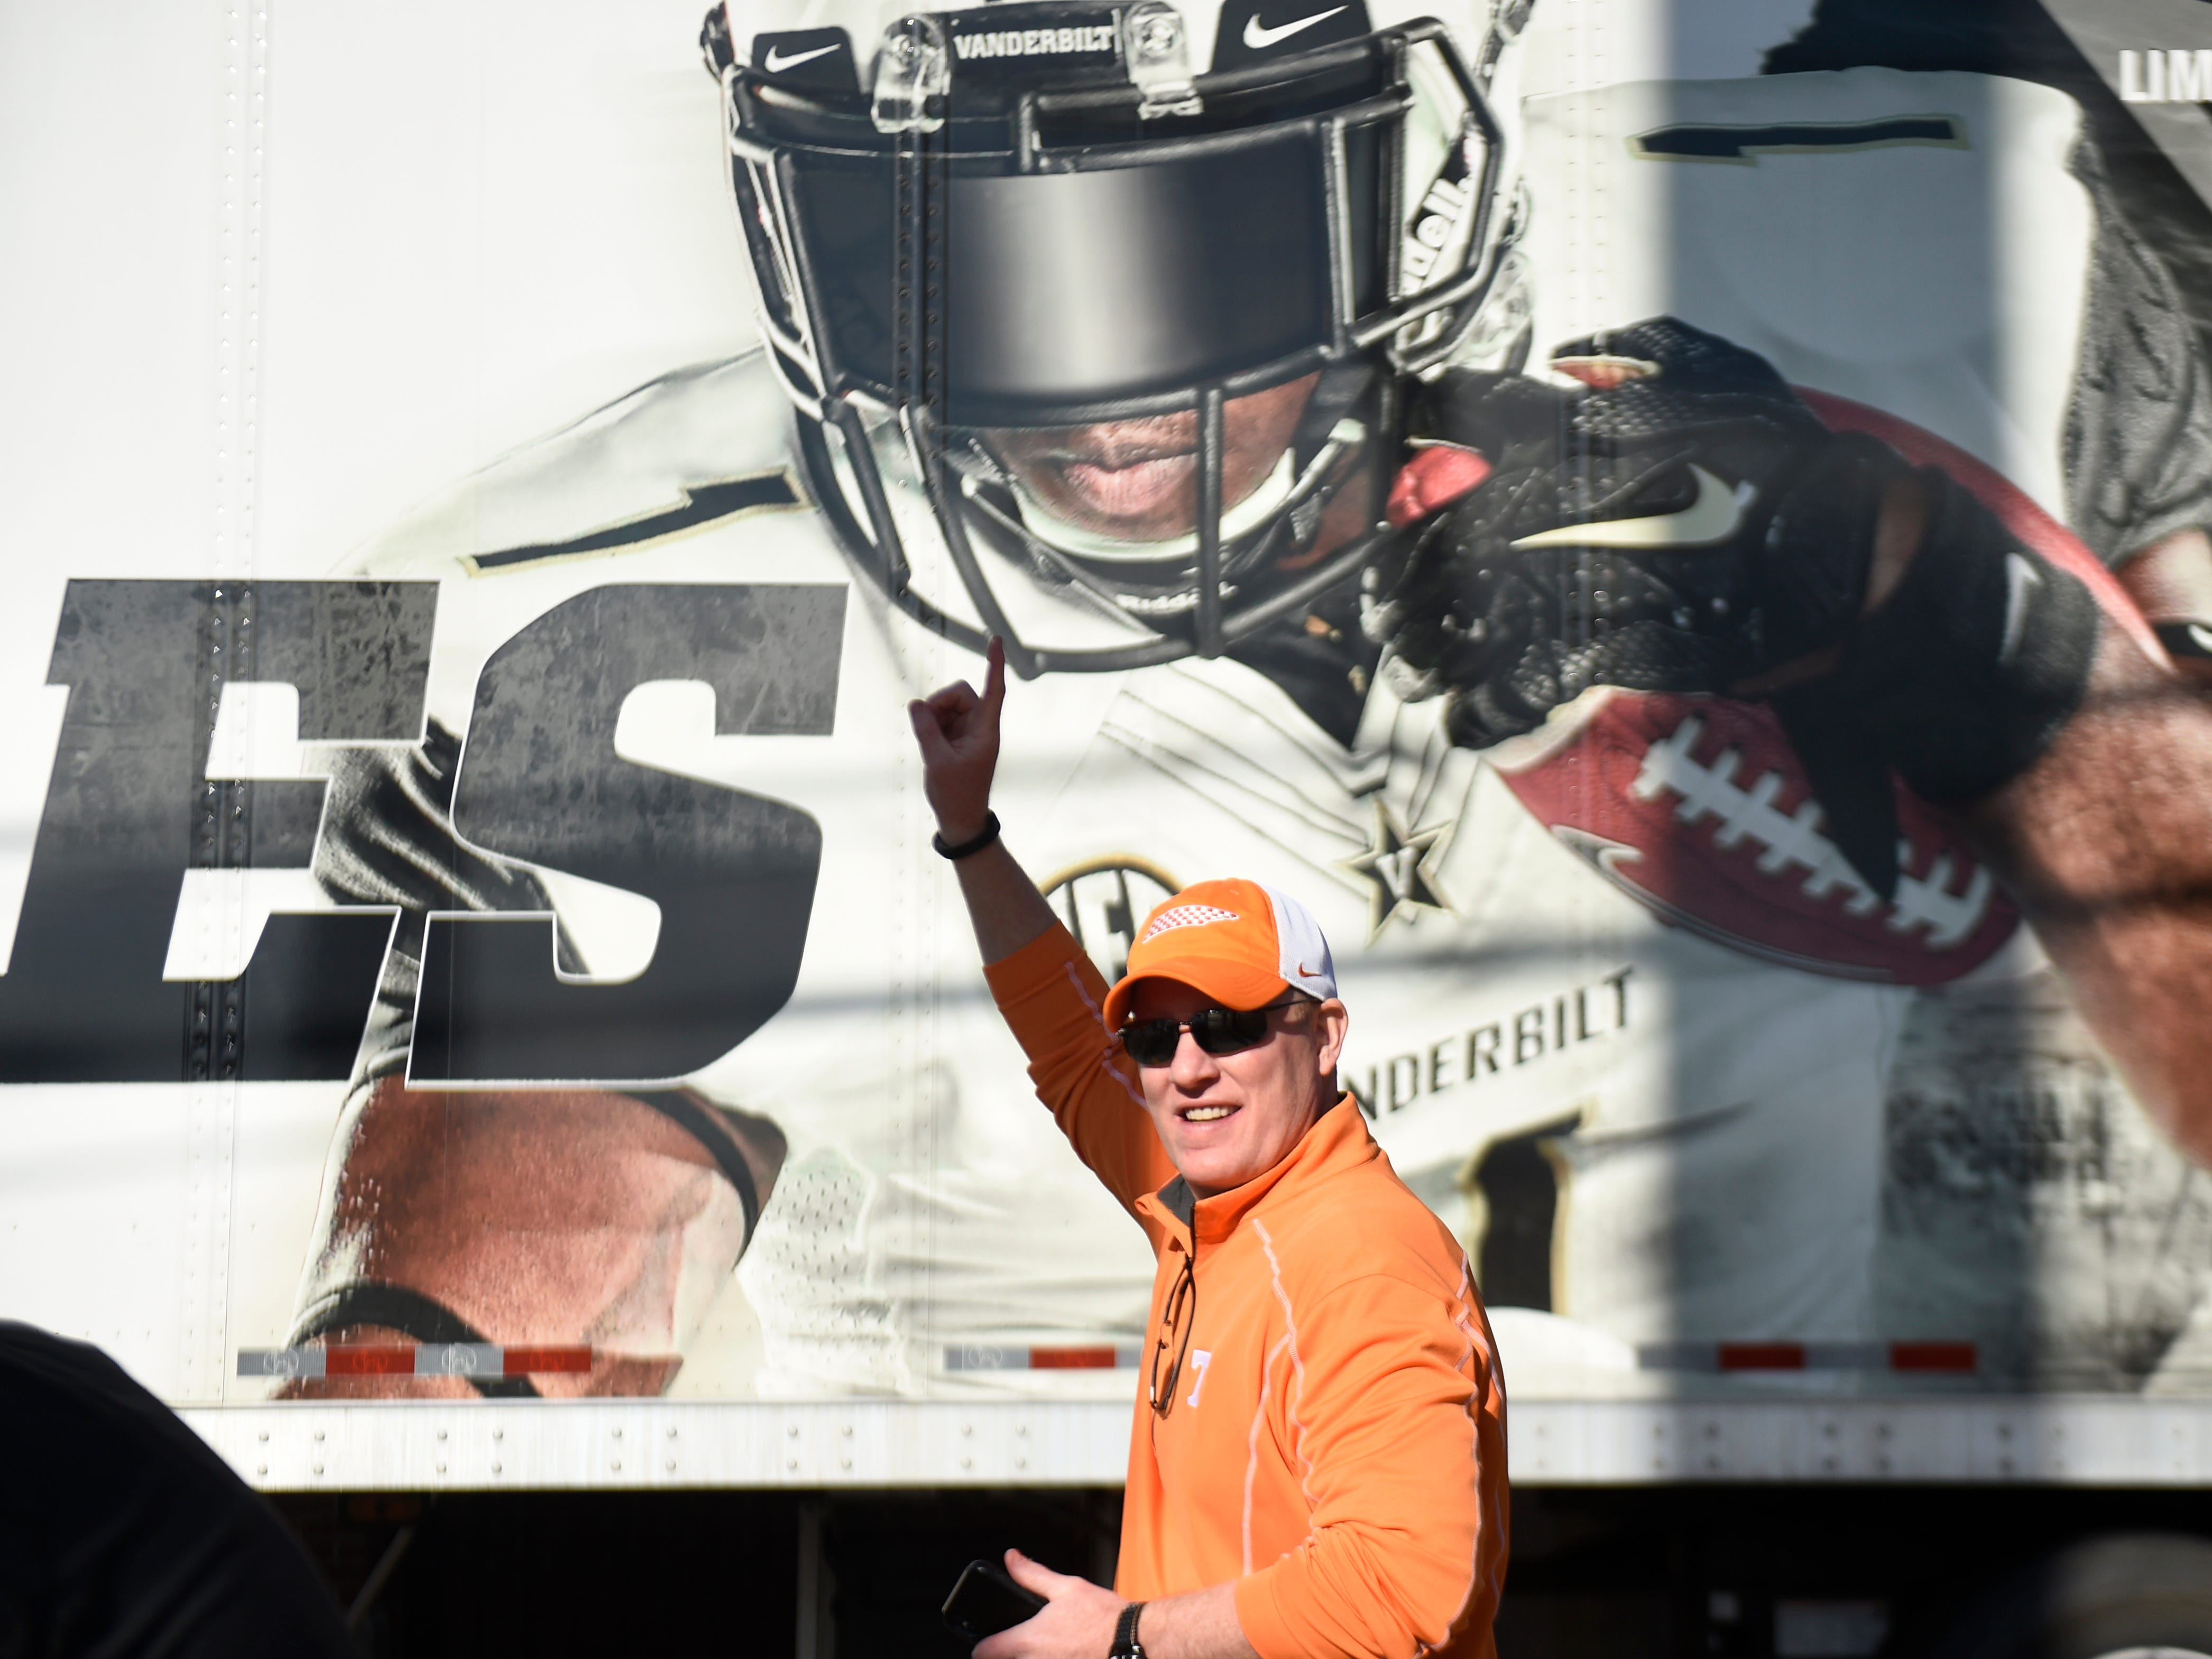 A Tennessee fan walks past a Vandy sign before the game at Vanderbilt Stadium Saturday, Nov. 24, 2018, in Nashville, Tenn.